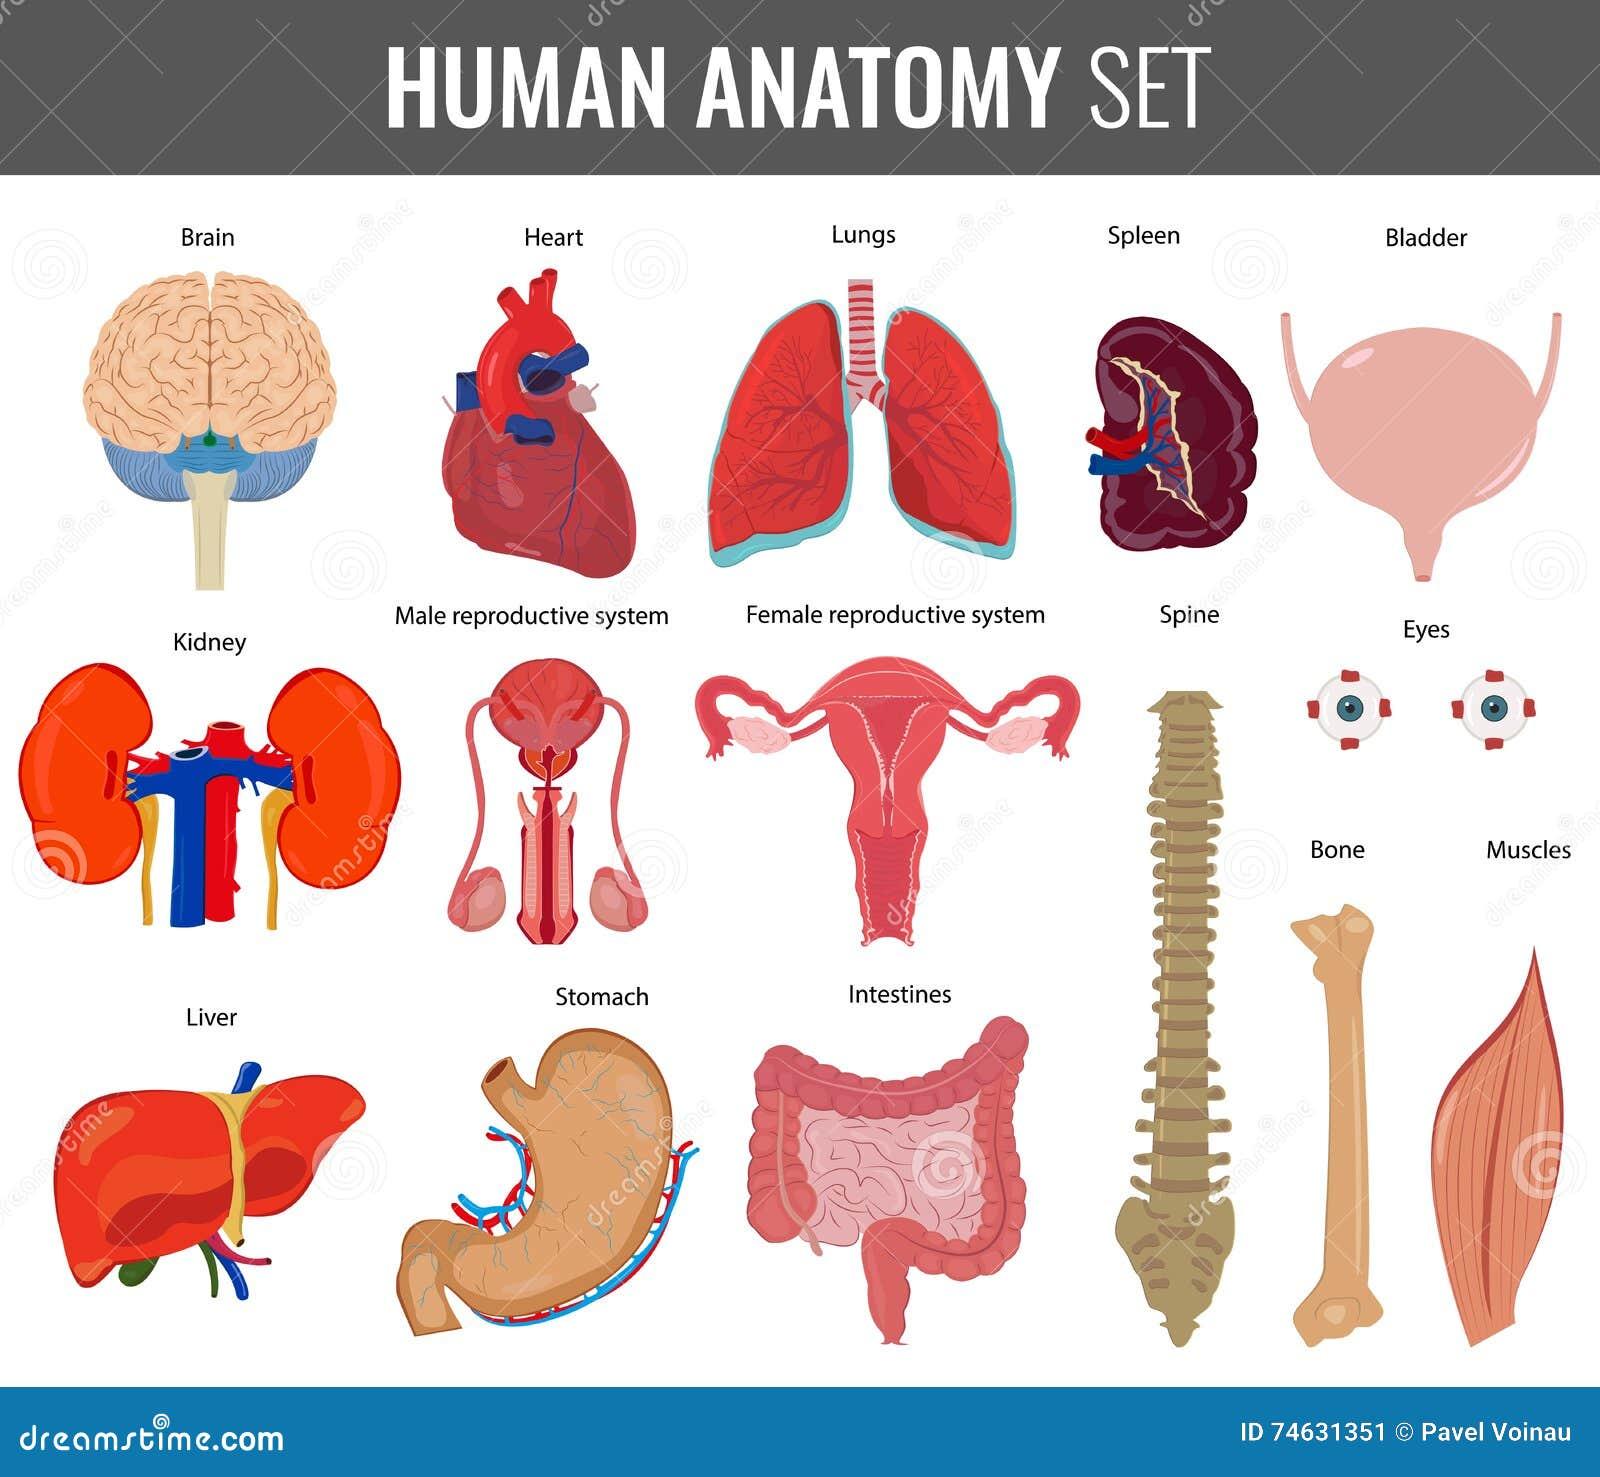 Human Internal Organs Anatomy Set Vector Stock Vector